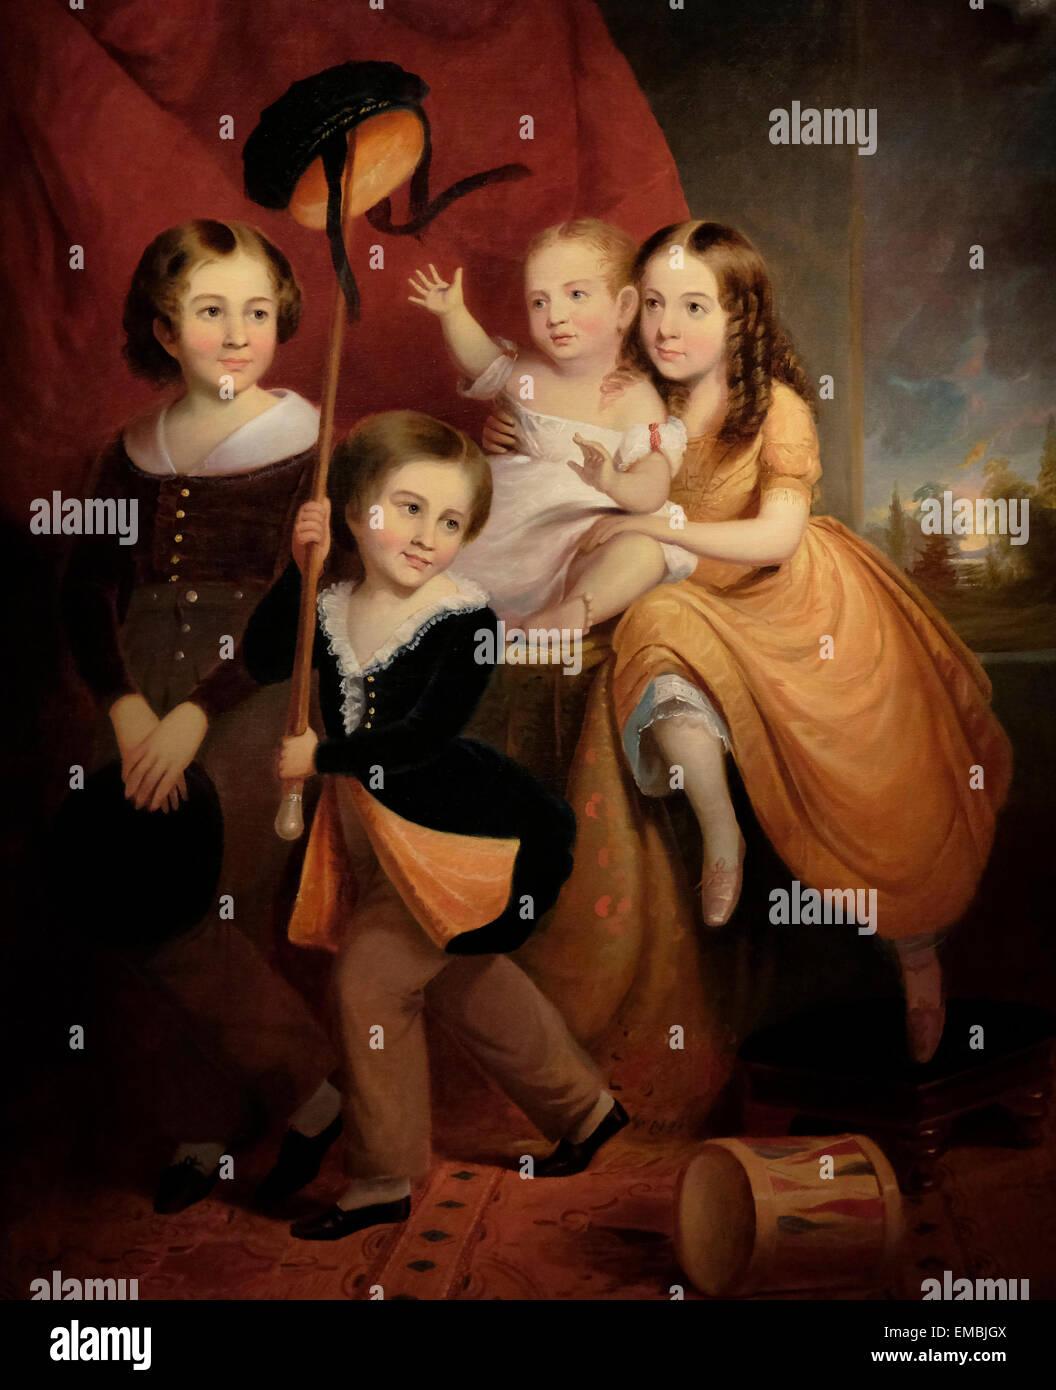 The Stephens Children, 1845, Unidentified Artist - Stock Image